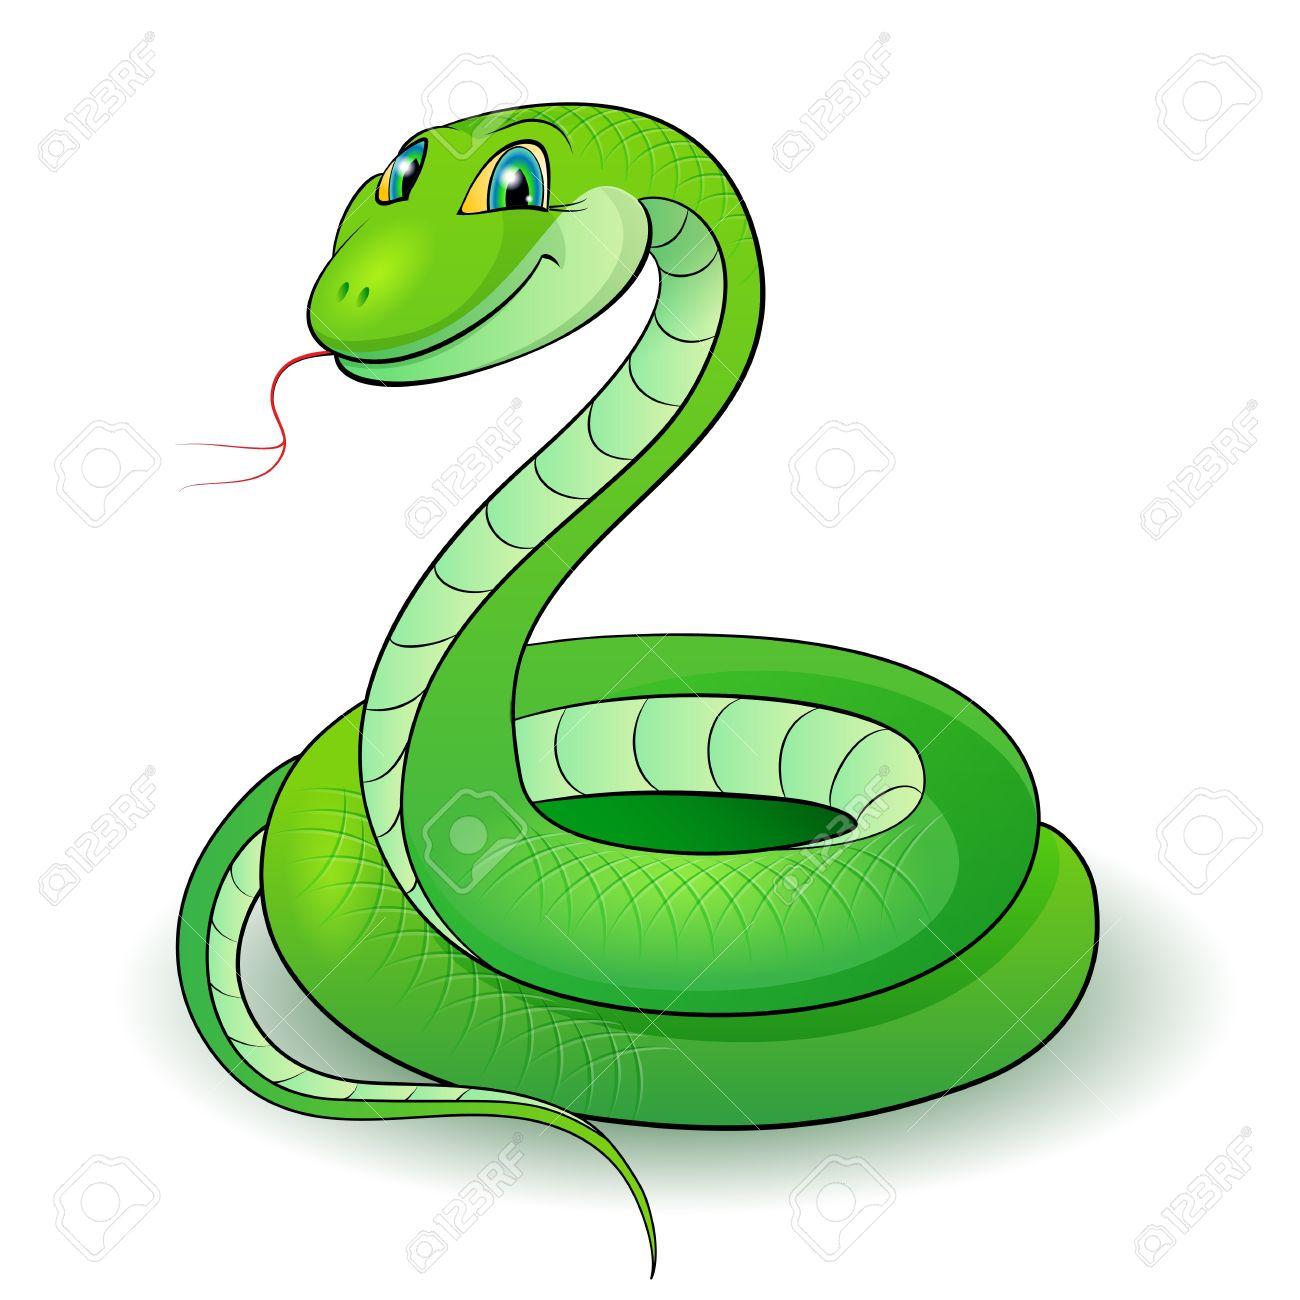 Dessin Animé Serpent illustration de dessin animé d'un serpent de verdure agréable. clip